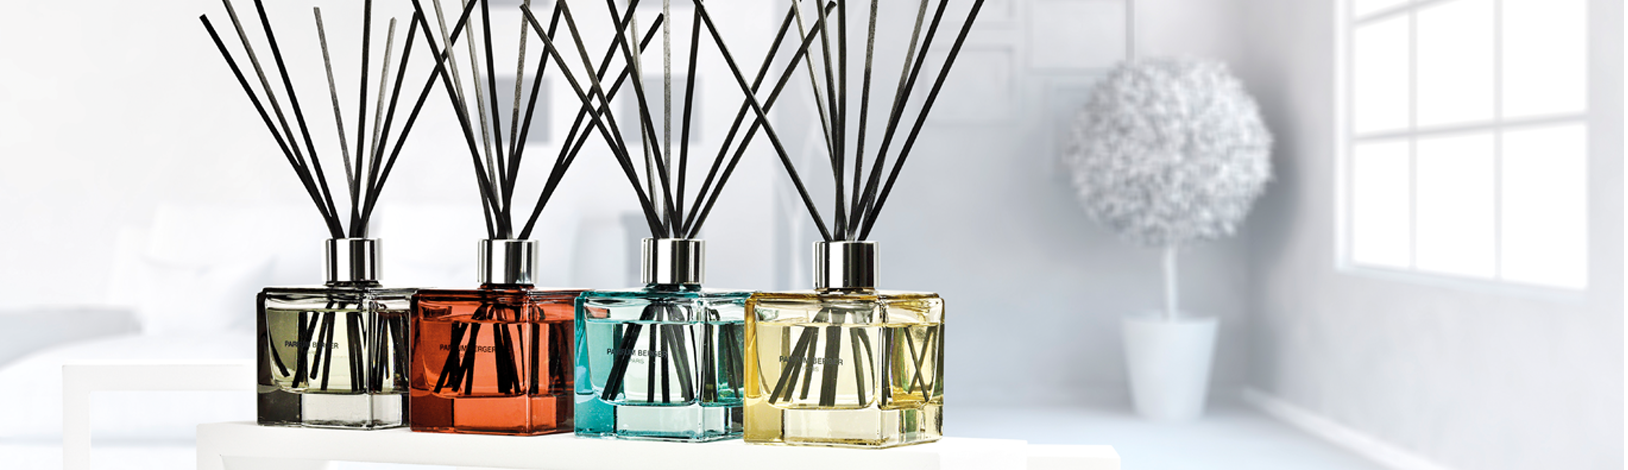 Anti-odour collection